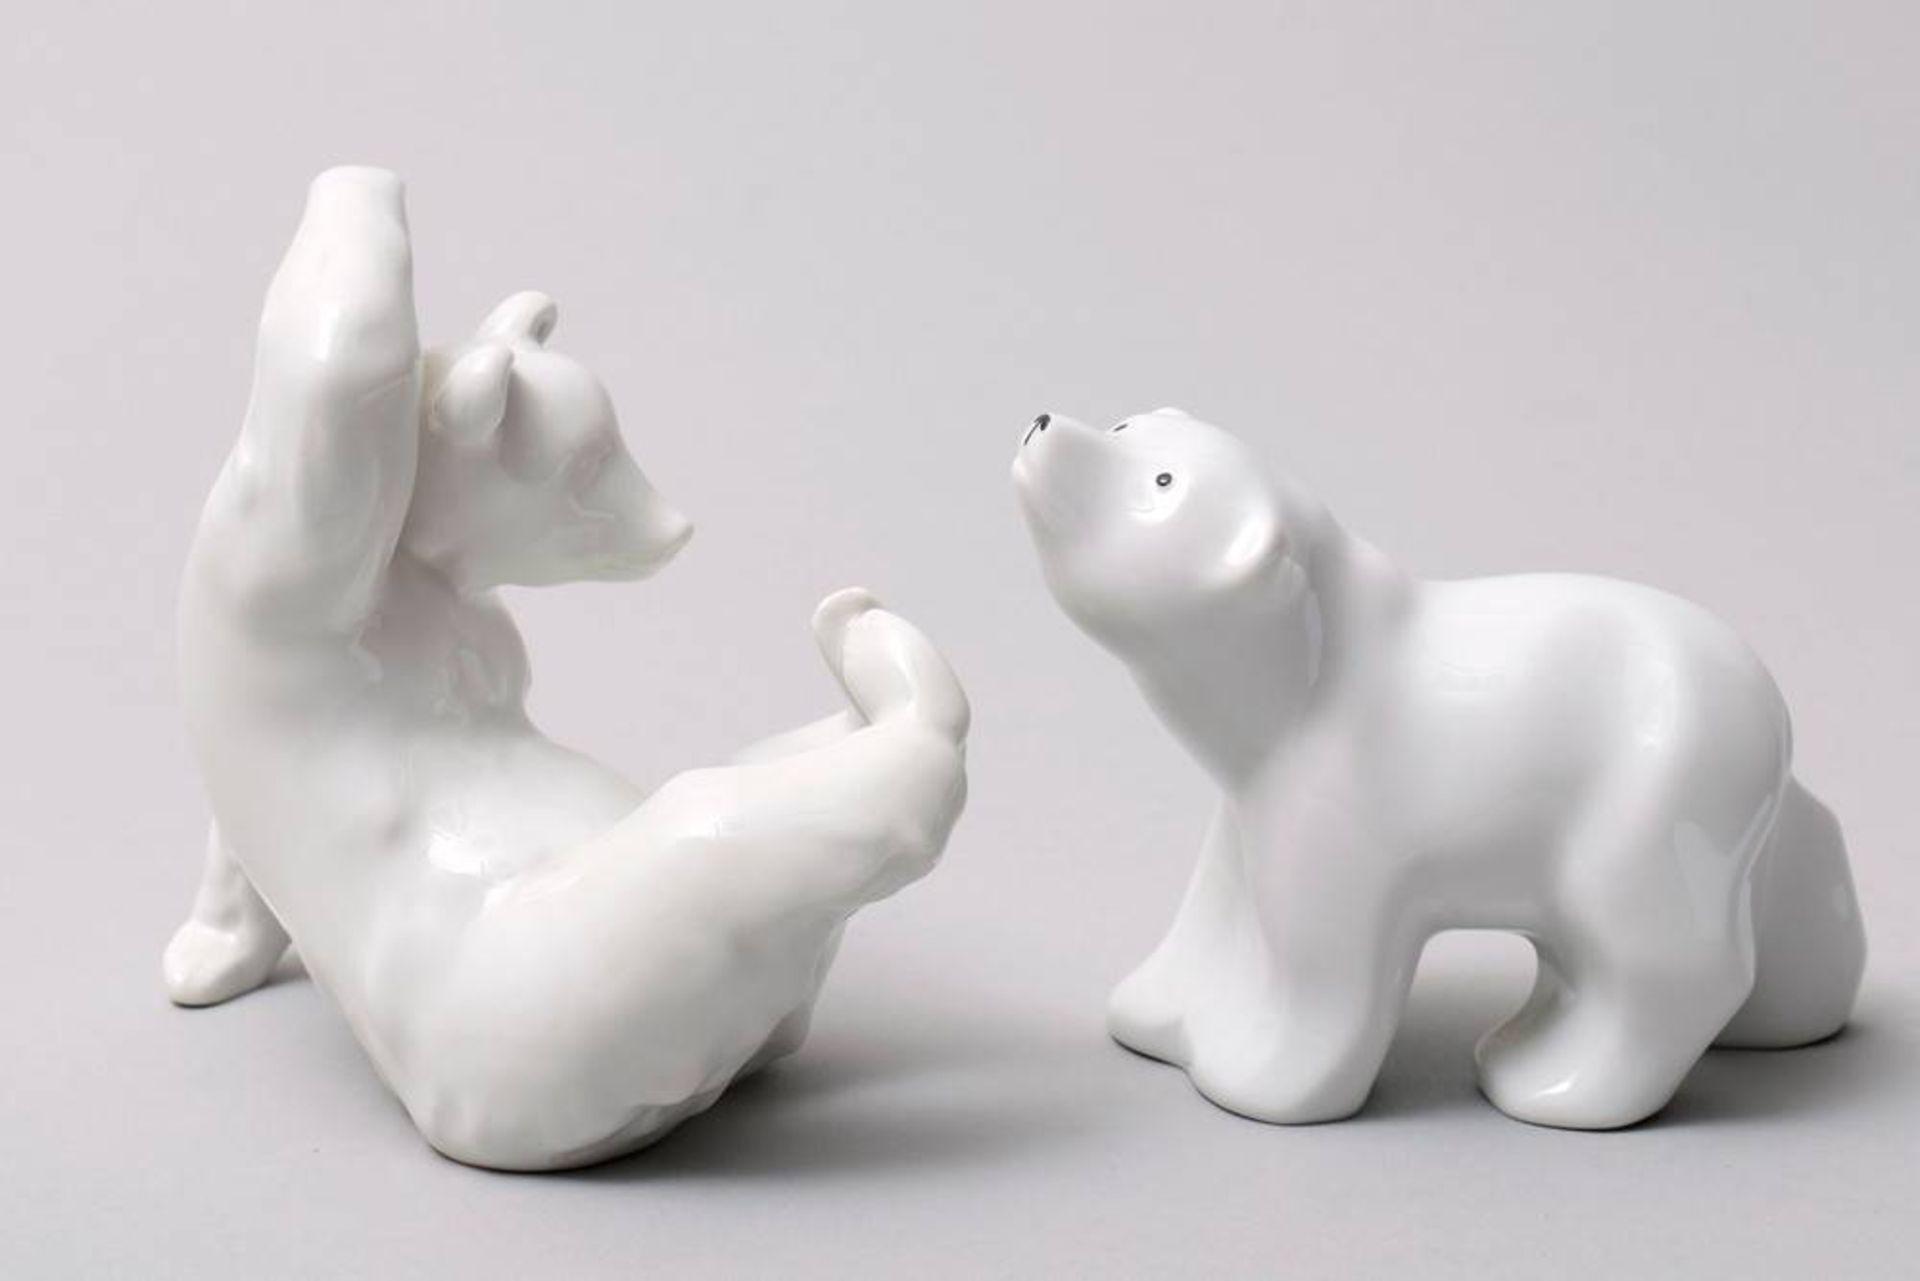 2 Bären, KPM-Berlin, 20. Jhdt. Weißporzellan, 1x sitzender Bär, die Pfoten hoch gestreckt, 1x - Bild 5 aus 5